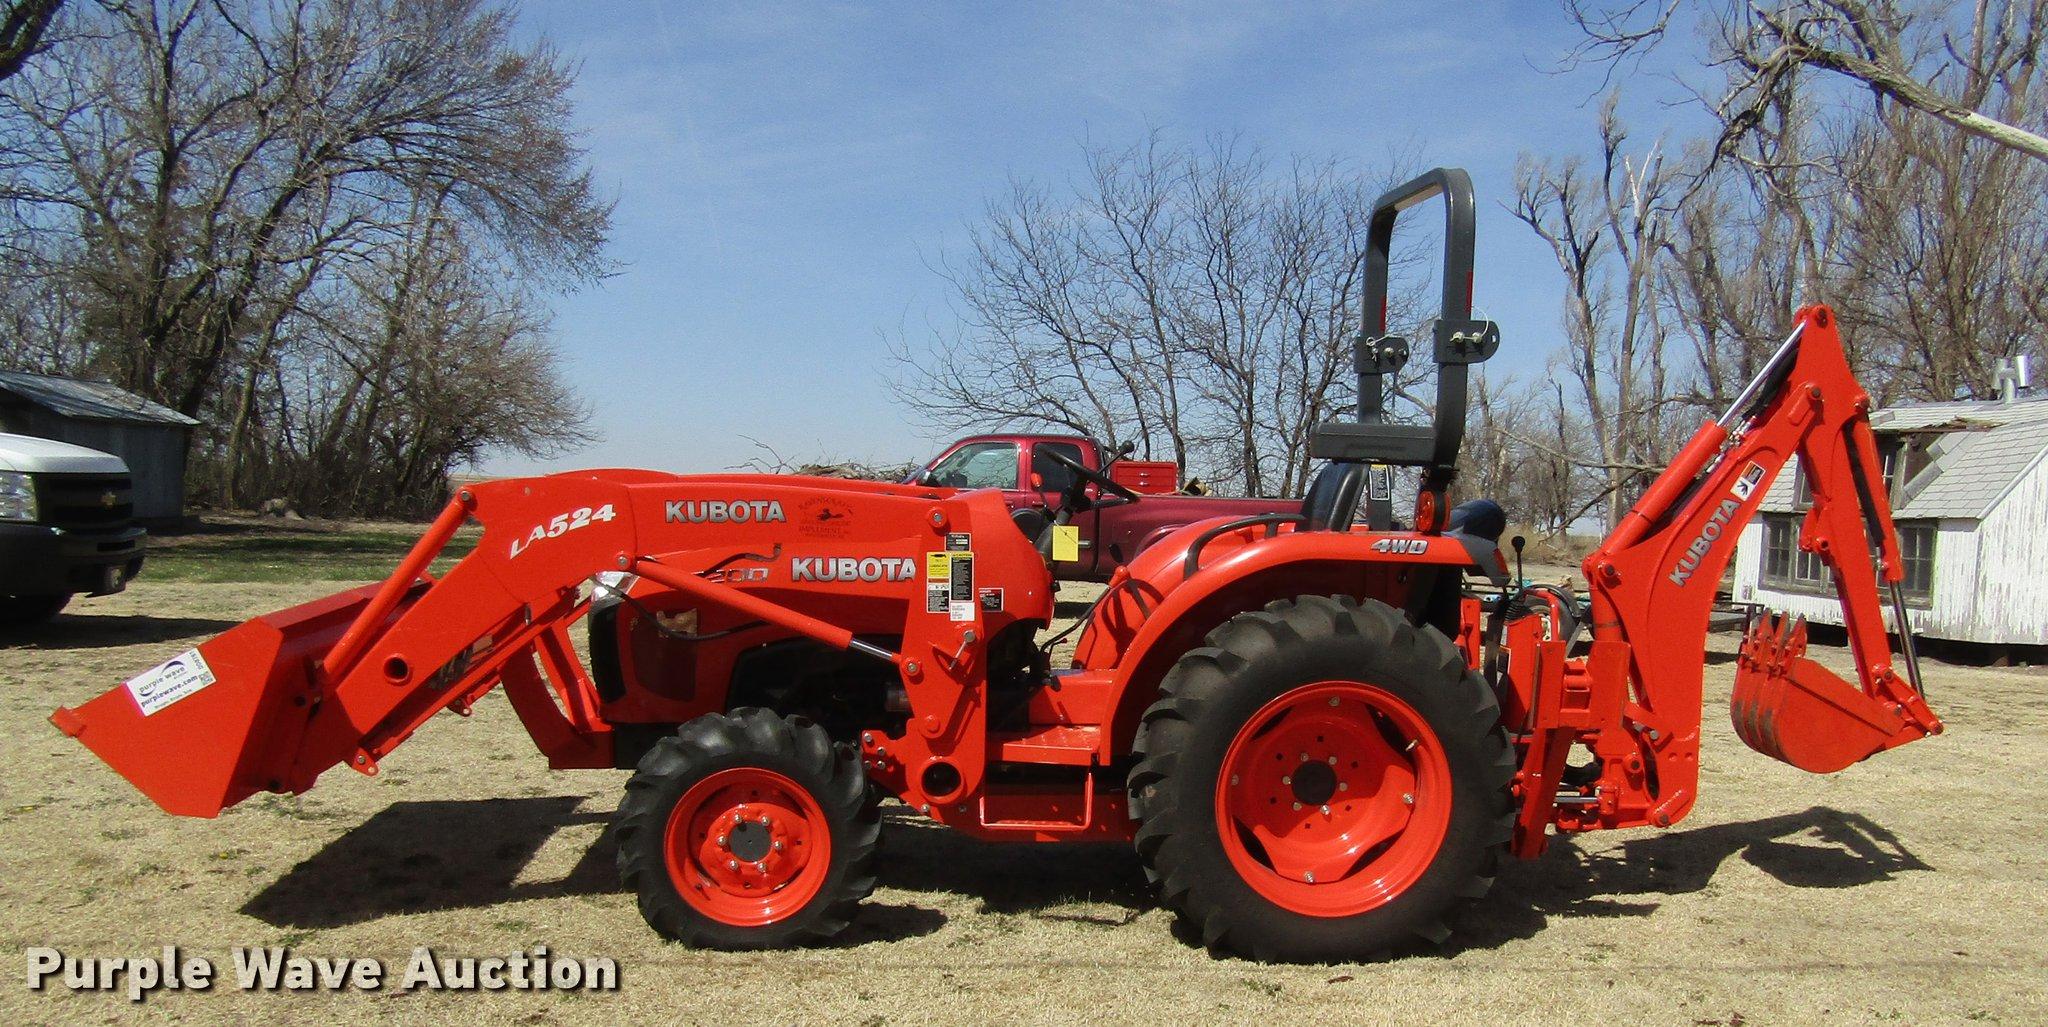 2013 Kubota L3200 HFWD tractor | Item DD8761 | SOLD! May 17